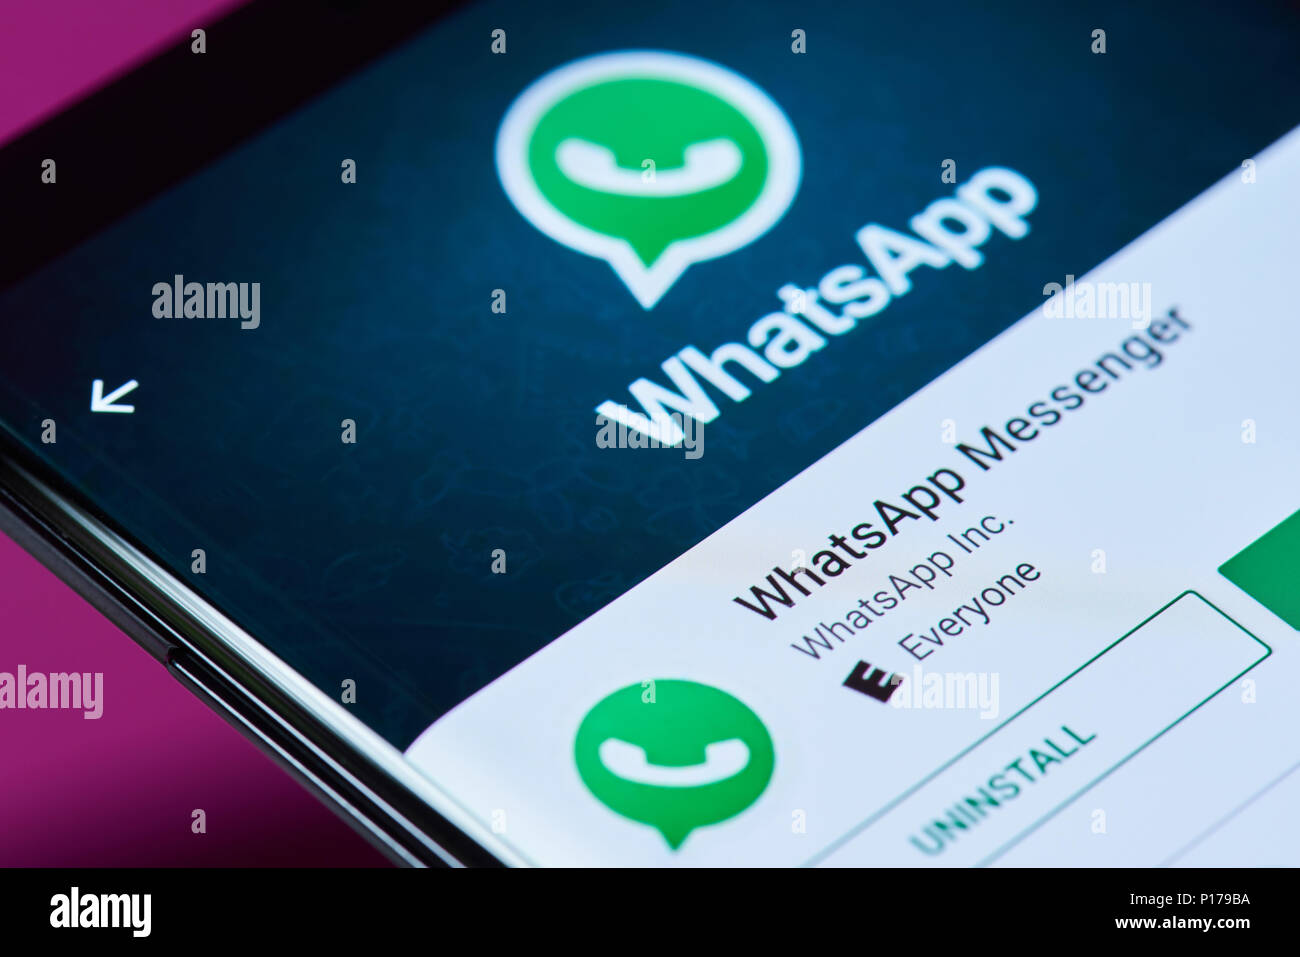 Whatsapp Stock Photos & Whatsapp Stock Images - Alamy